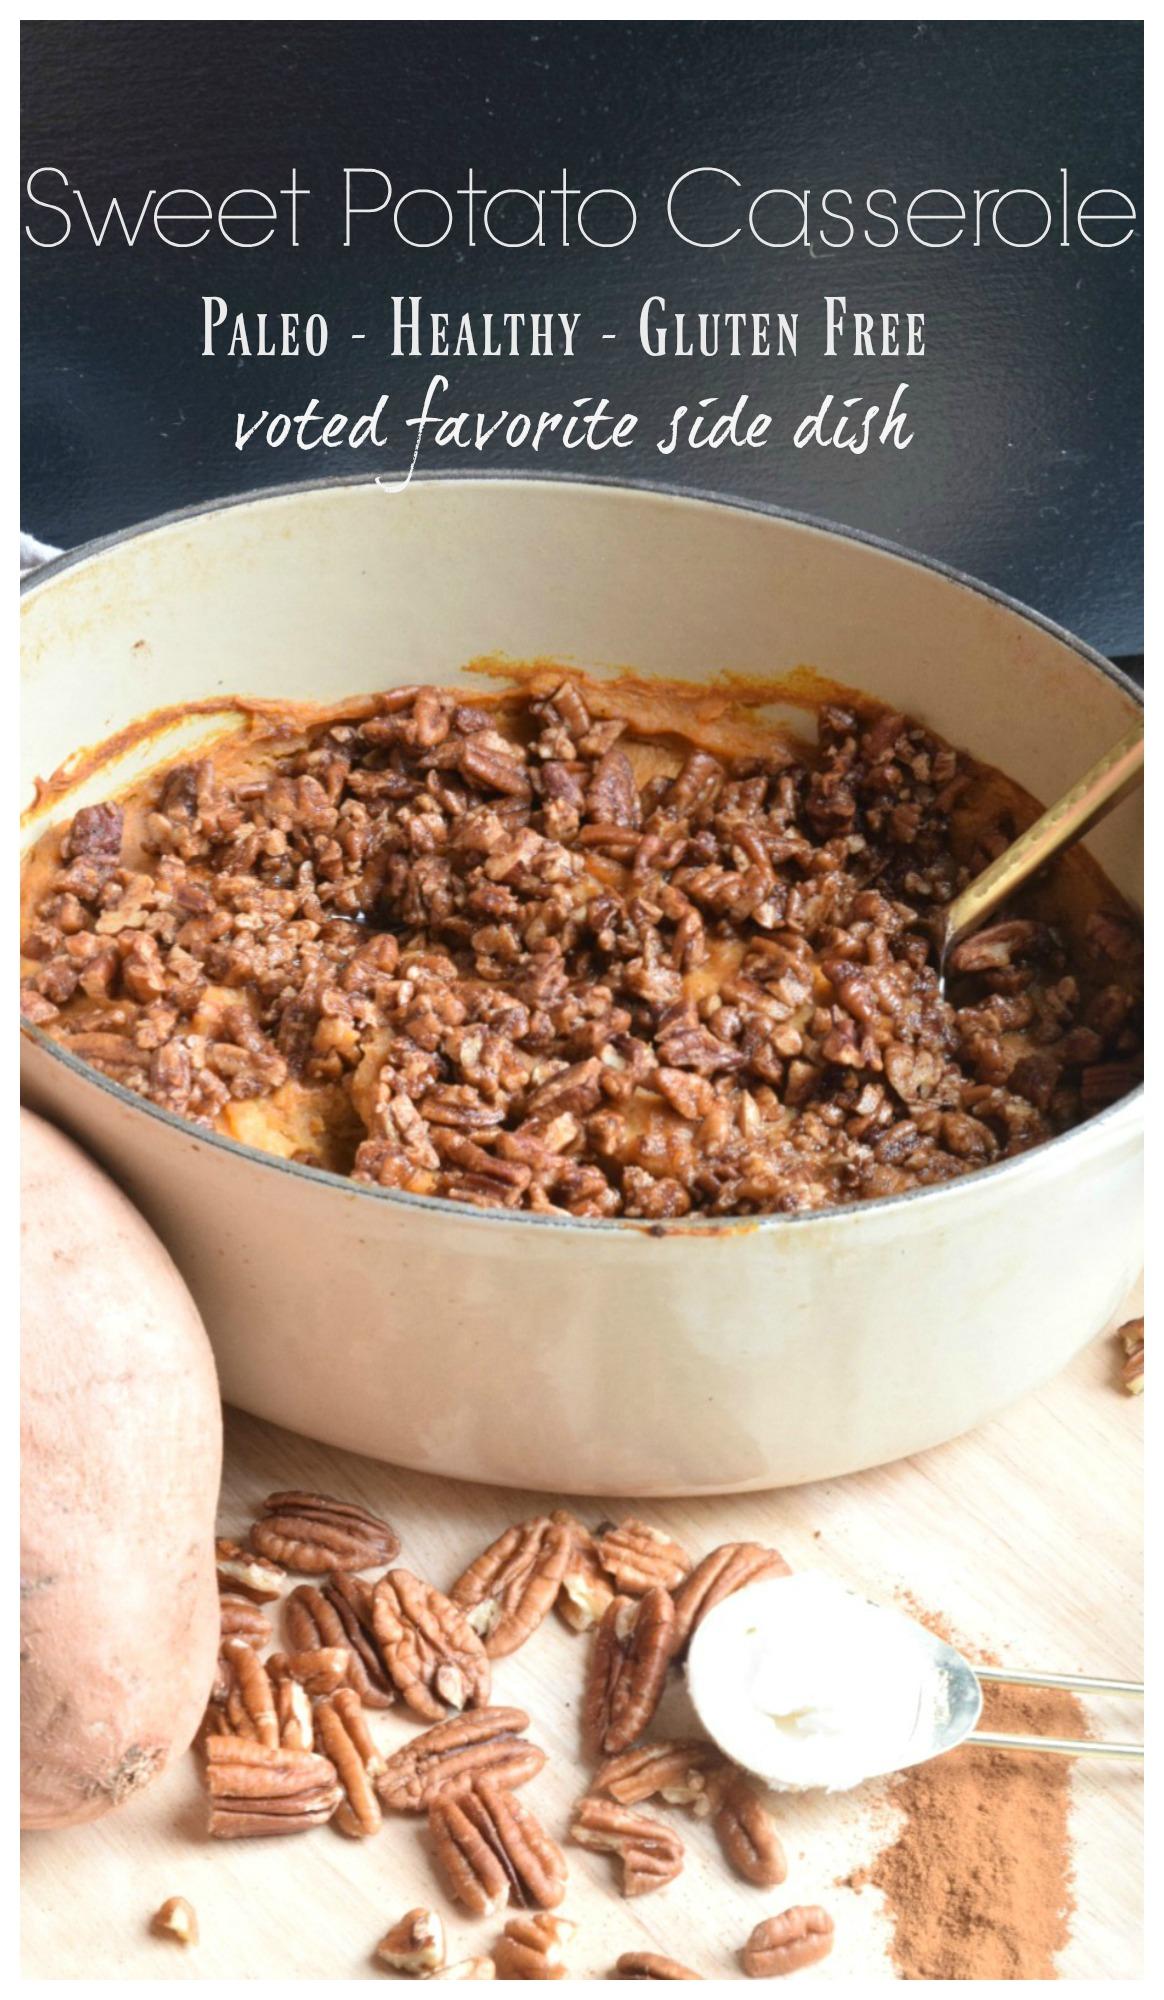 Sweet Potato Casserole- Voted Favorite Side Dish- Paleo Recipe